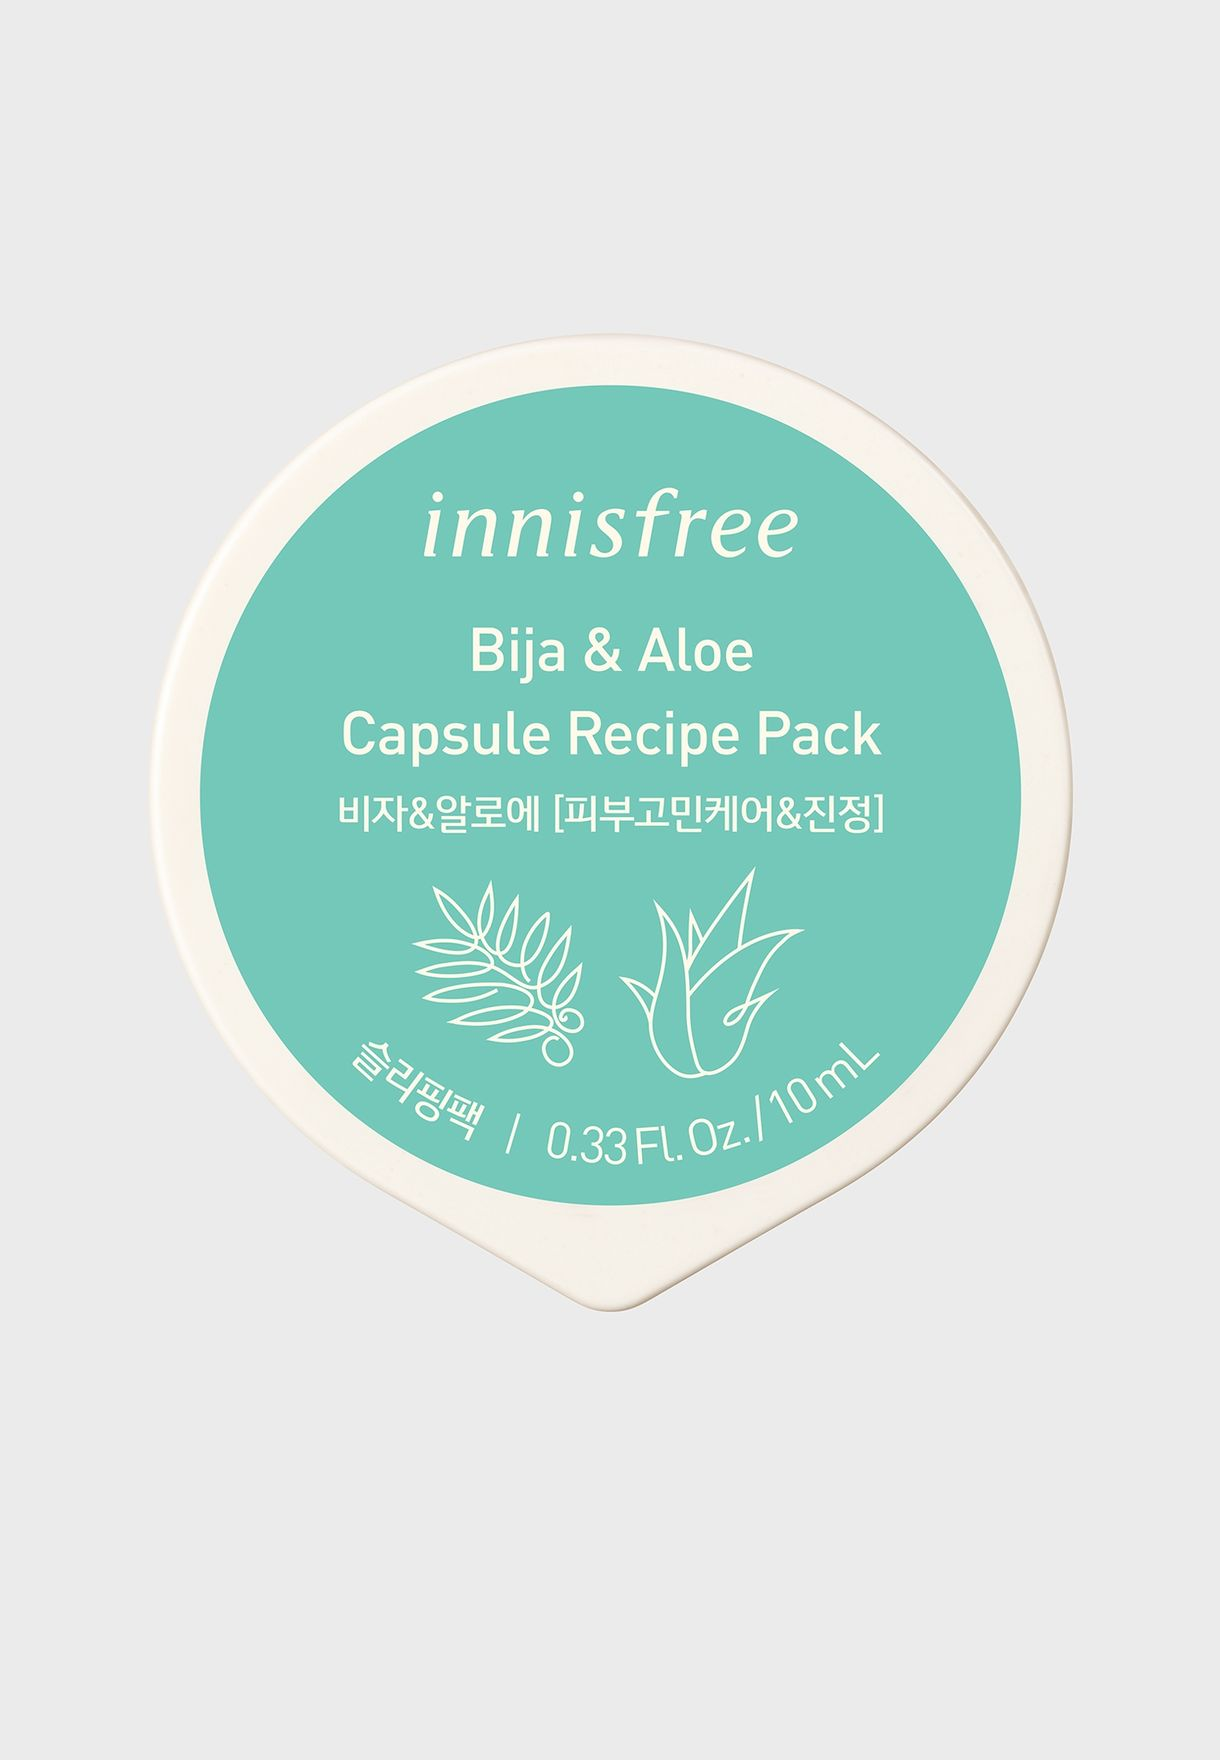 Bija & Aloe Capsule Recipe Pack 10ml